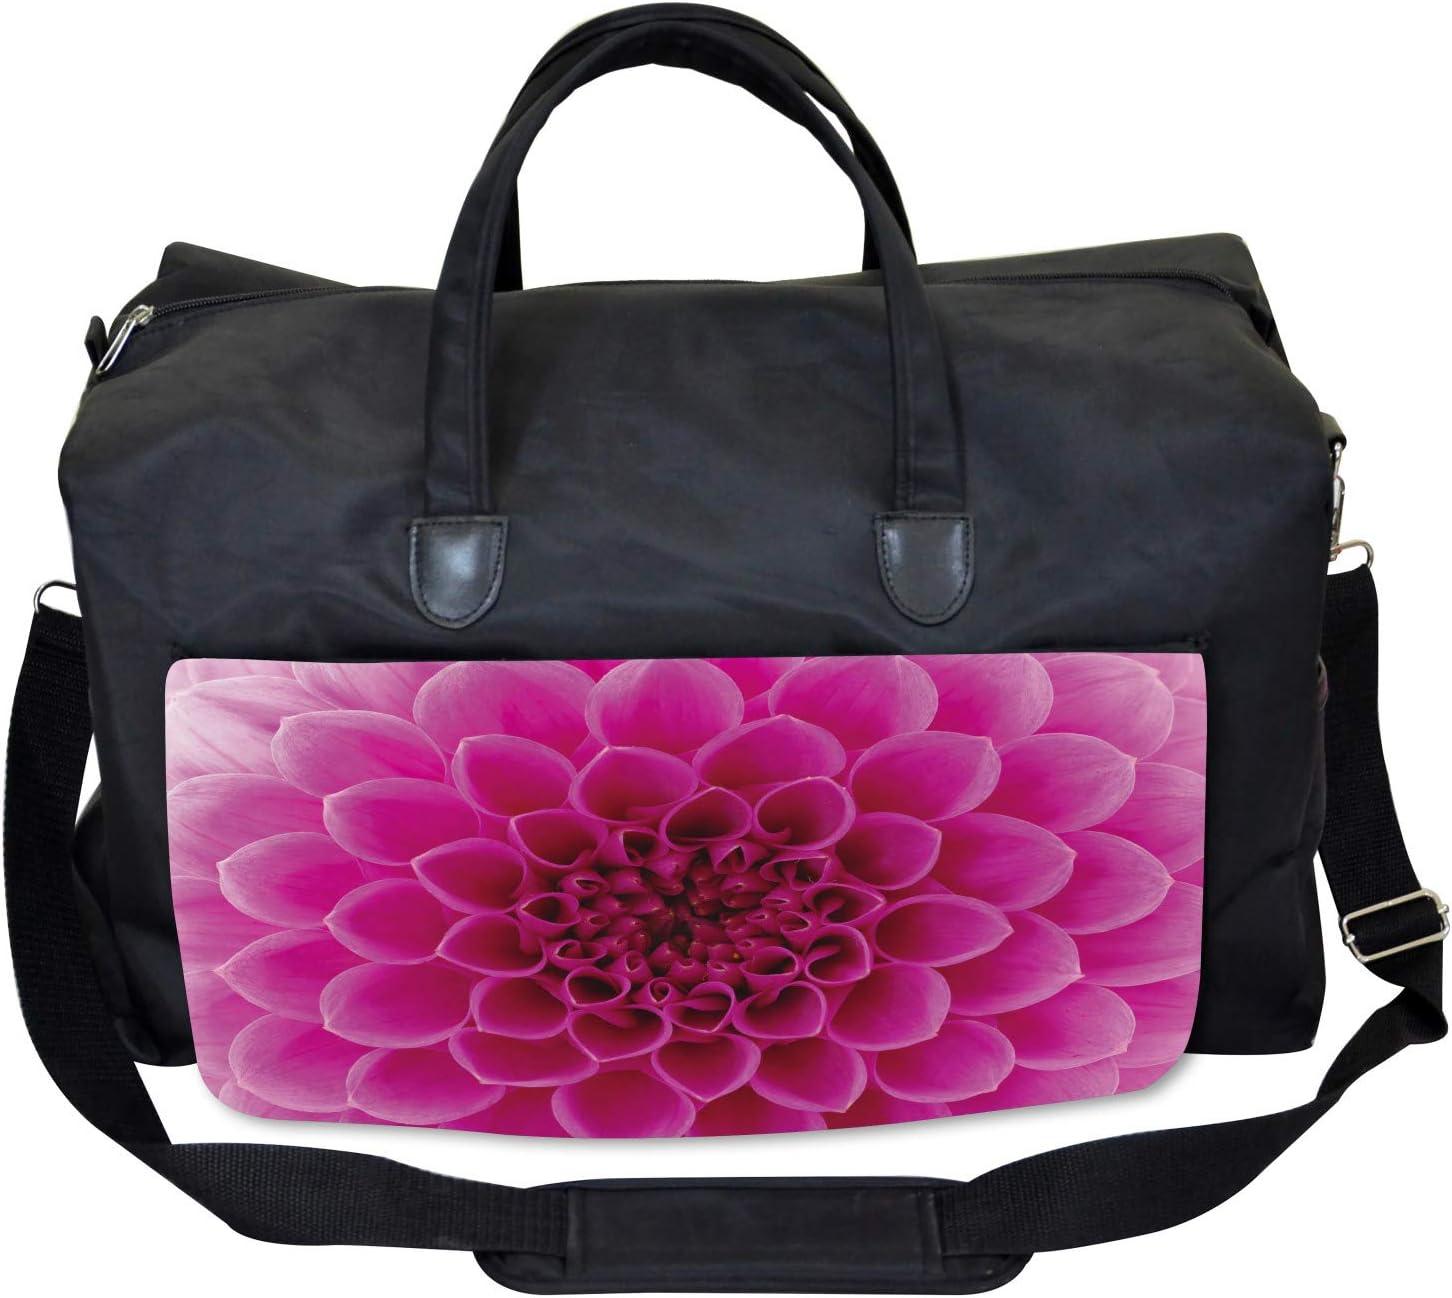 Fresh Bloom Petal Nature Ambesonne Floral Gym Bag Large Weekender Carry-on